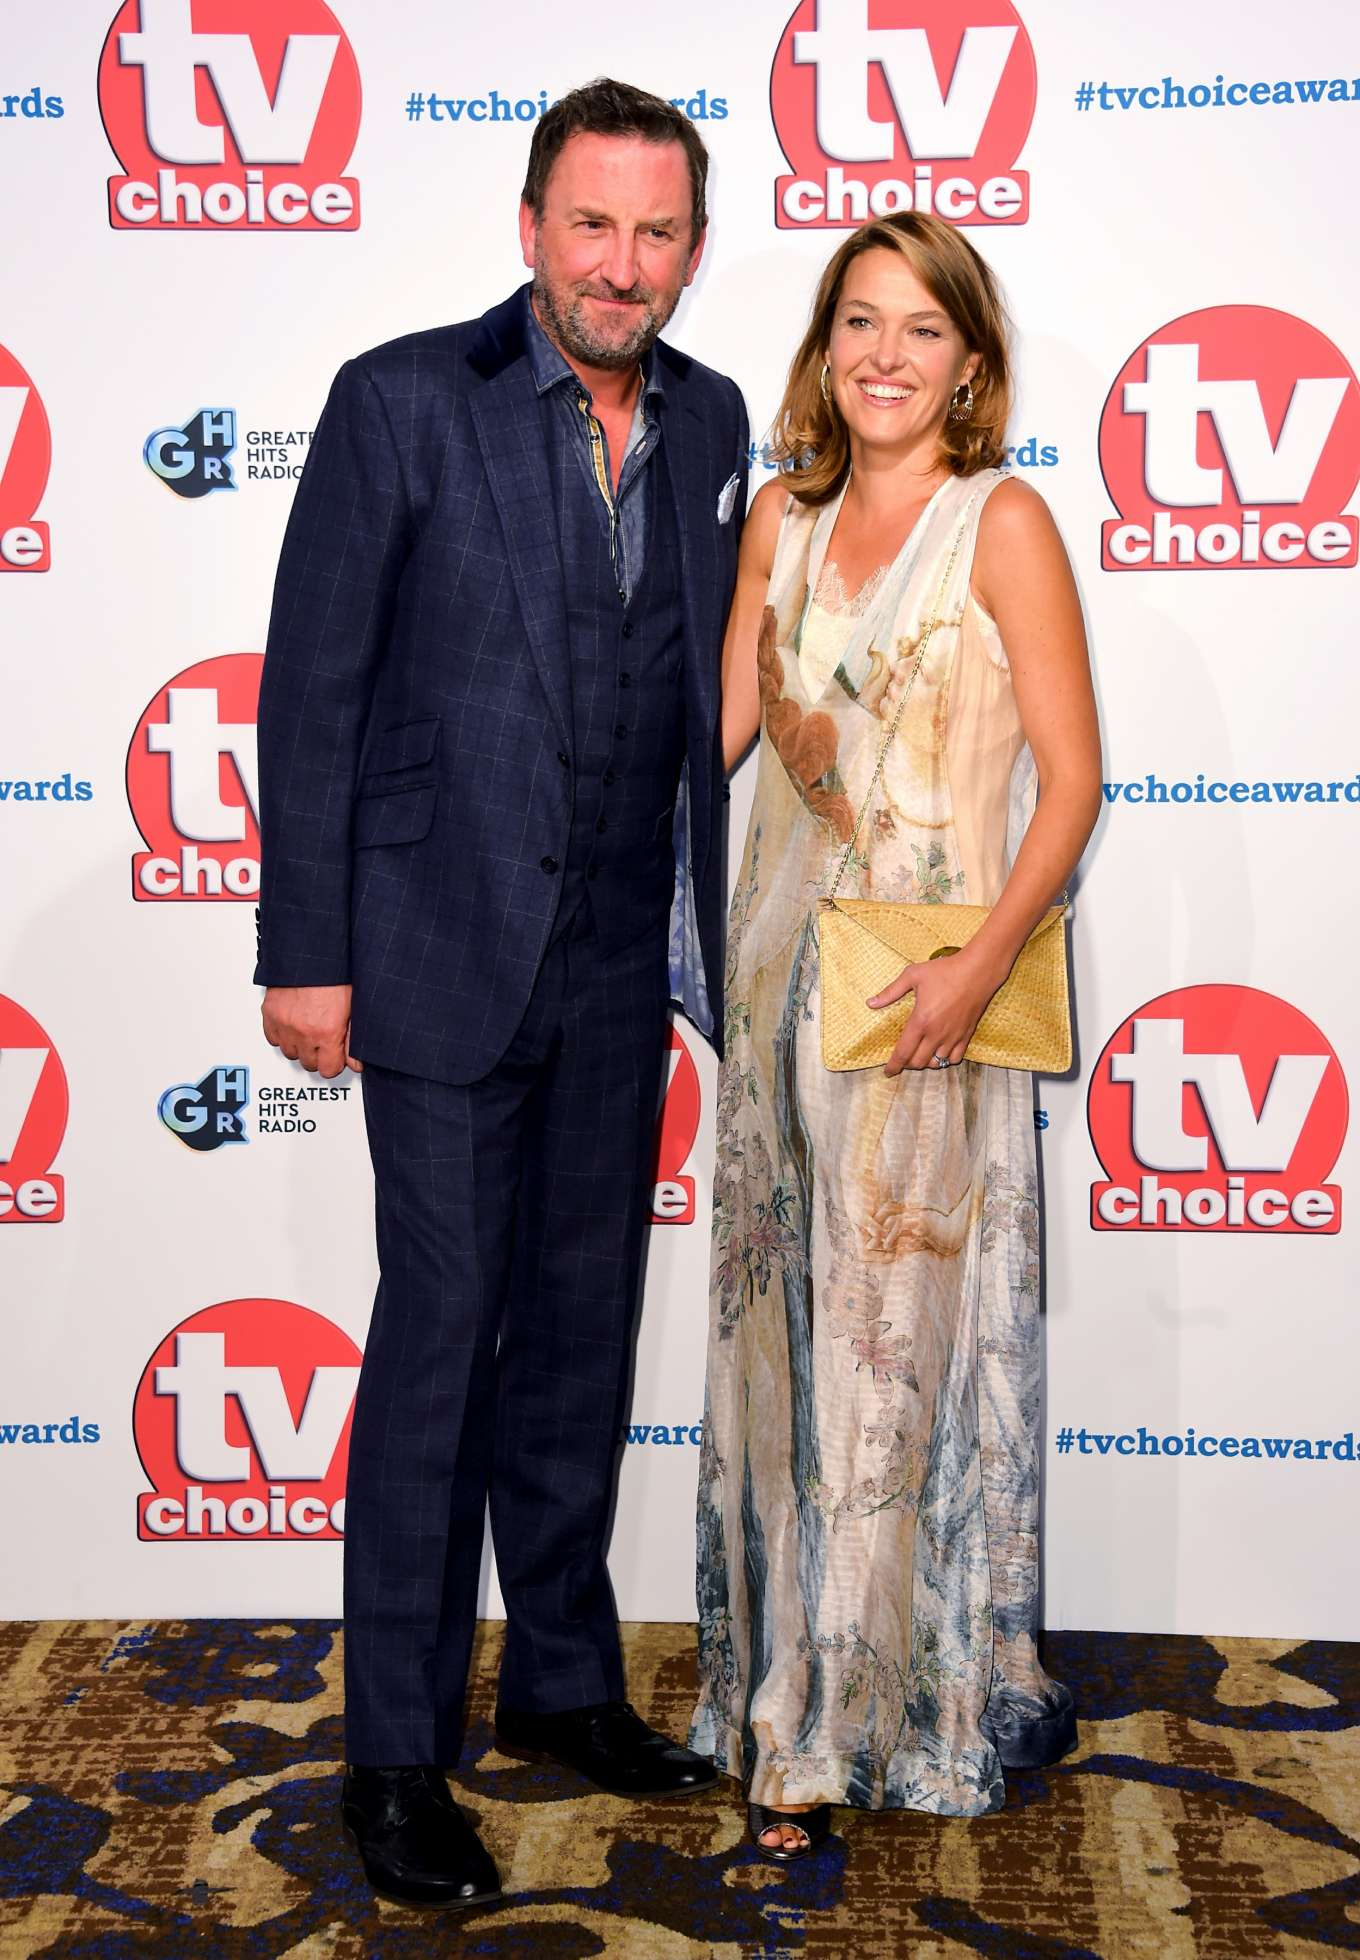 Sally Bretton - 2019 TV Choice Awards in London